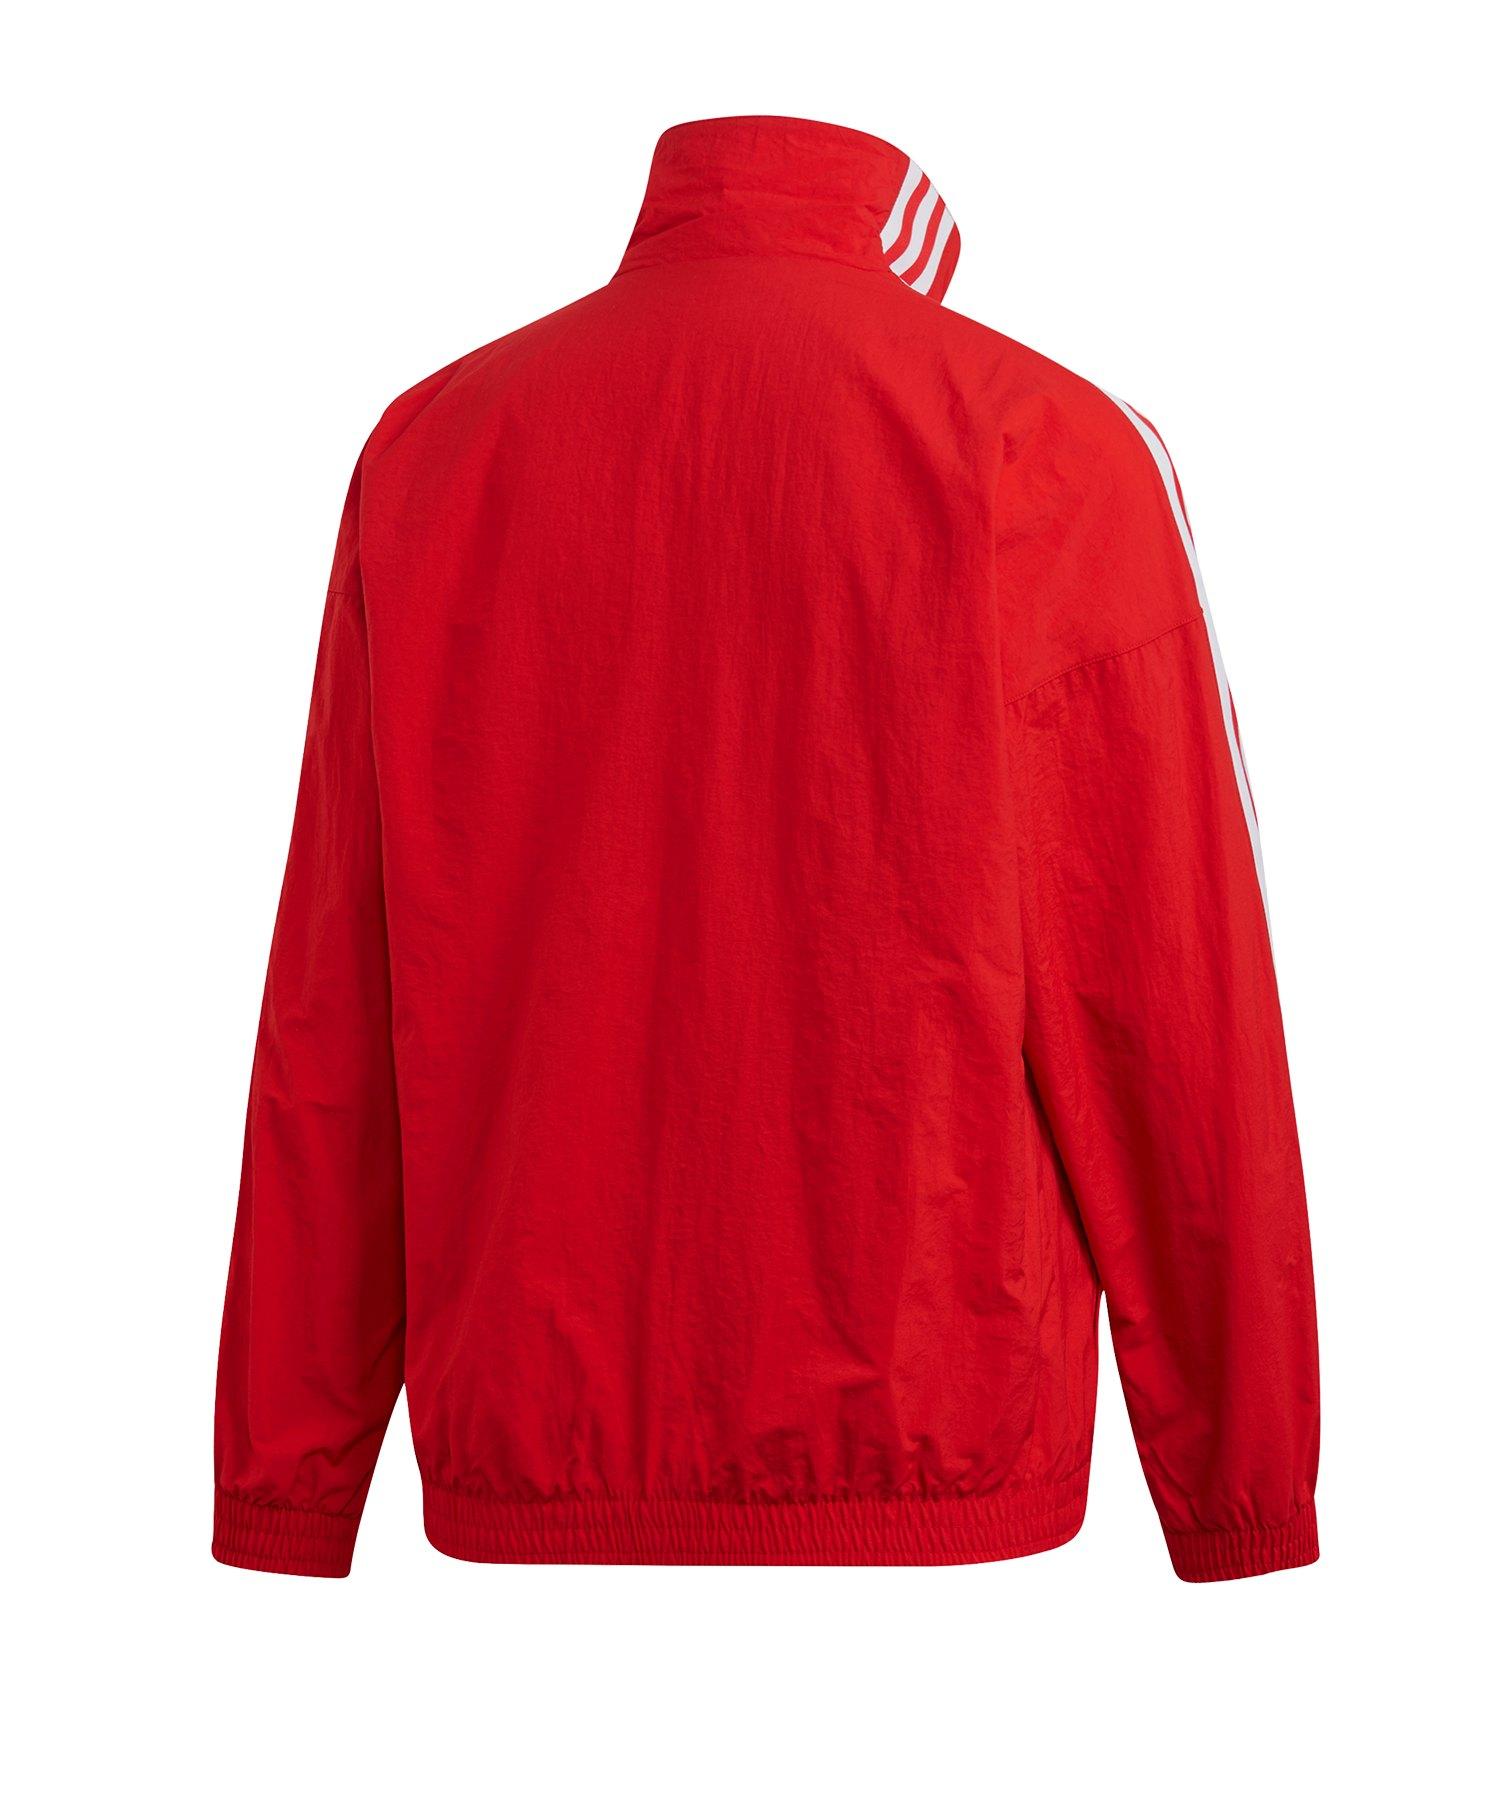 Adidas Damen Rot Kapuzenjacke Rot Rot Kapuzenjacke Adidas Damen Adidas Kapuzenjacke PZwXiOukT